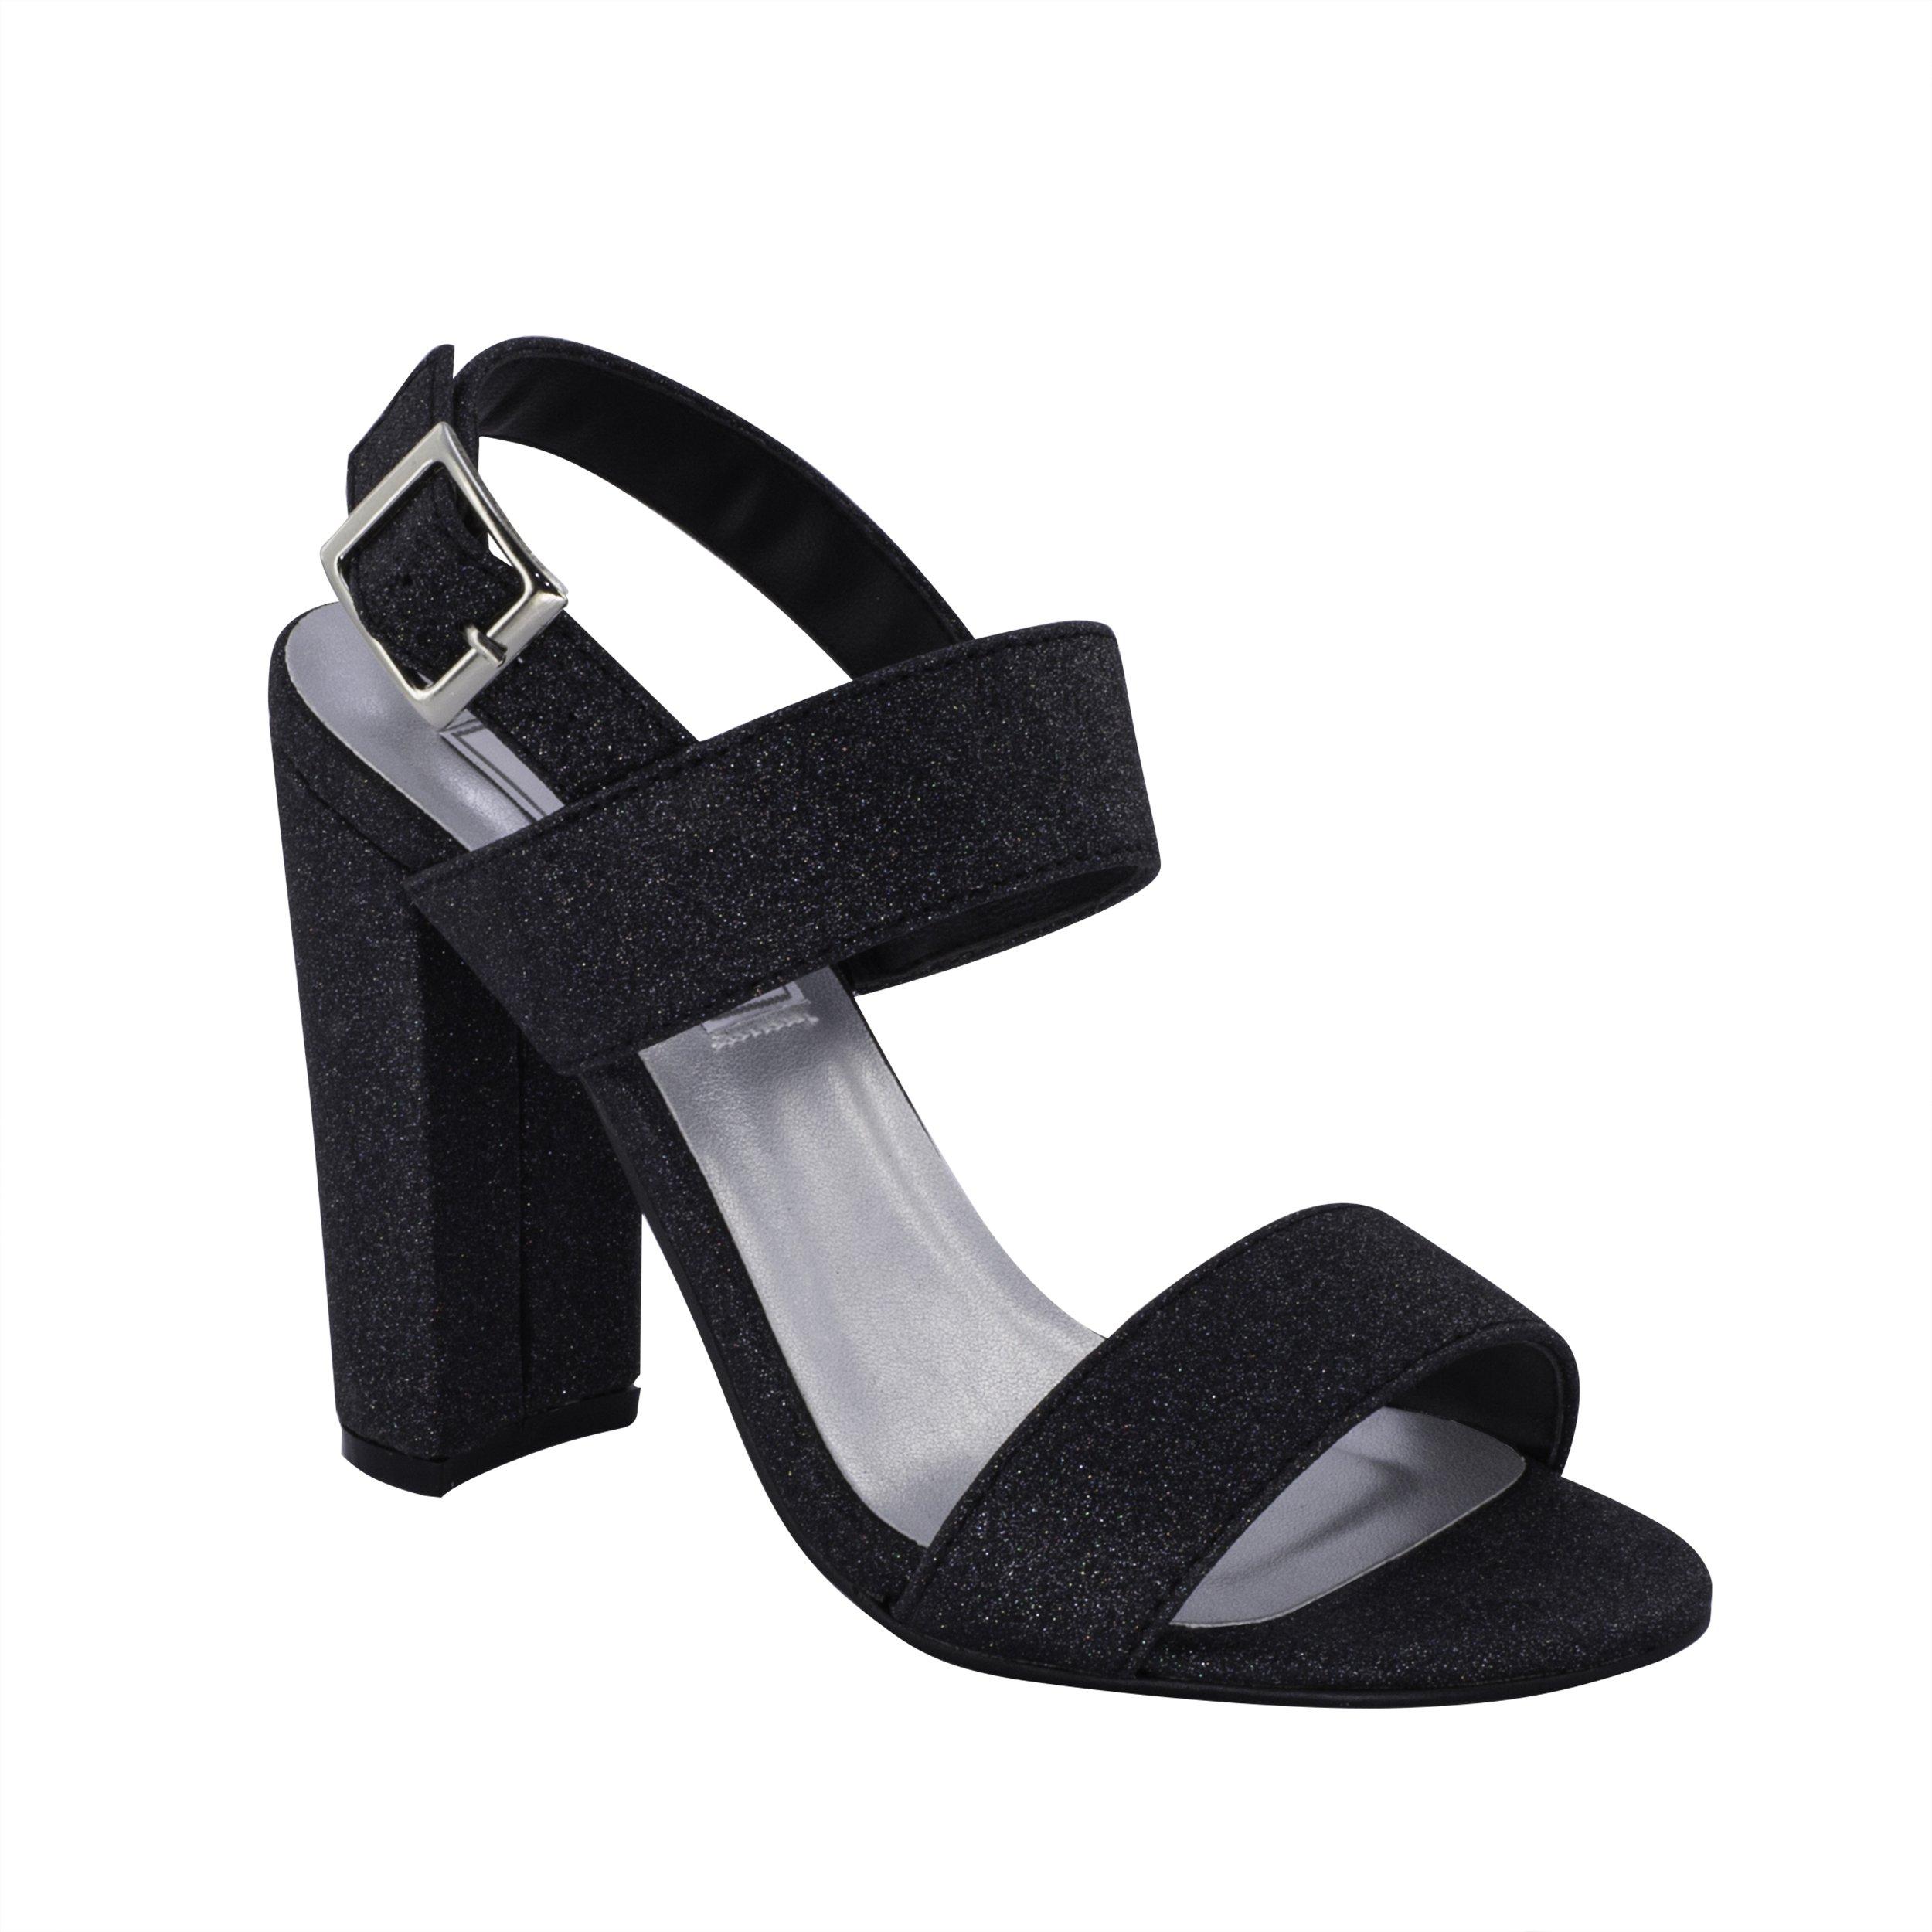 Touch Ups Women's Jordan Heeled Sandal, Black, 9 M US